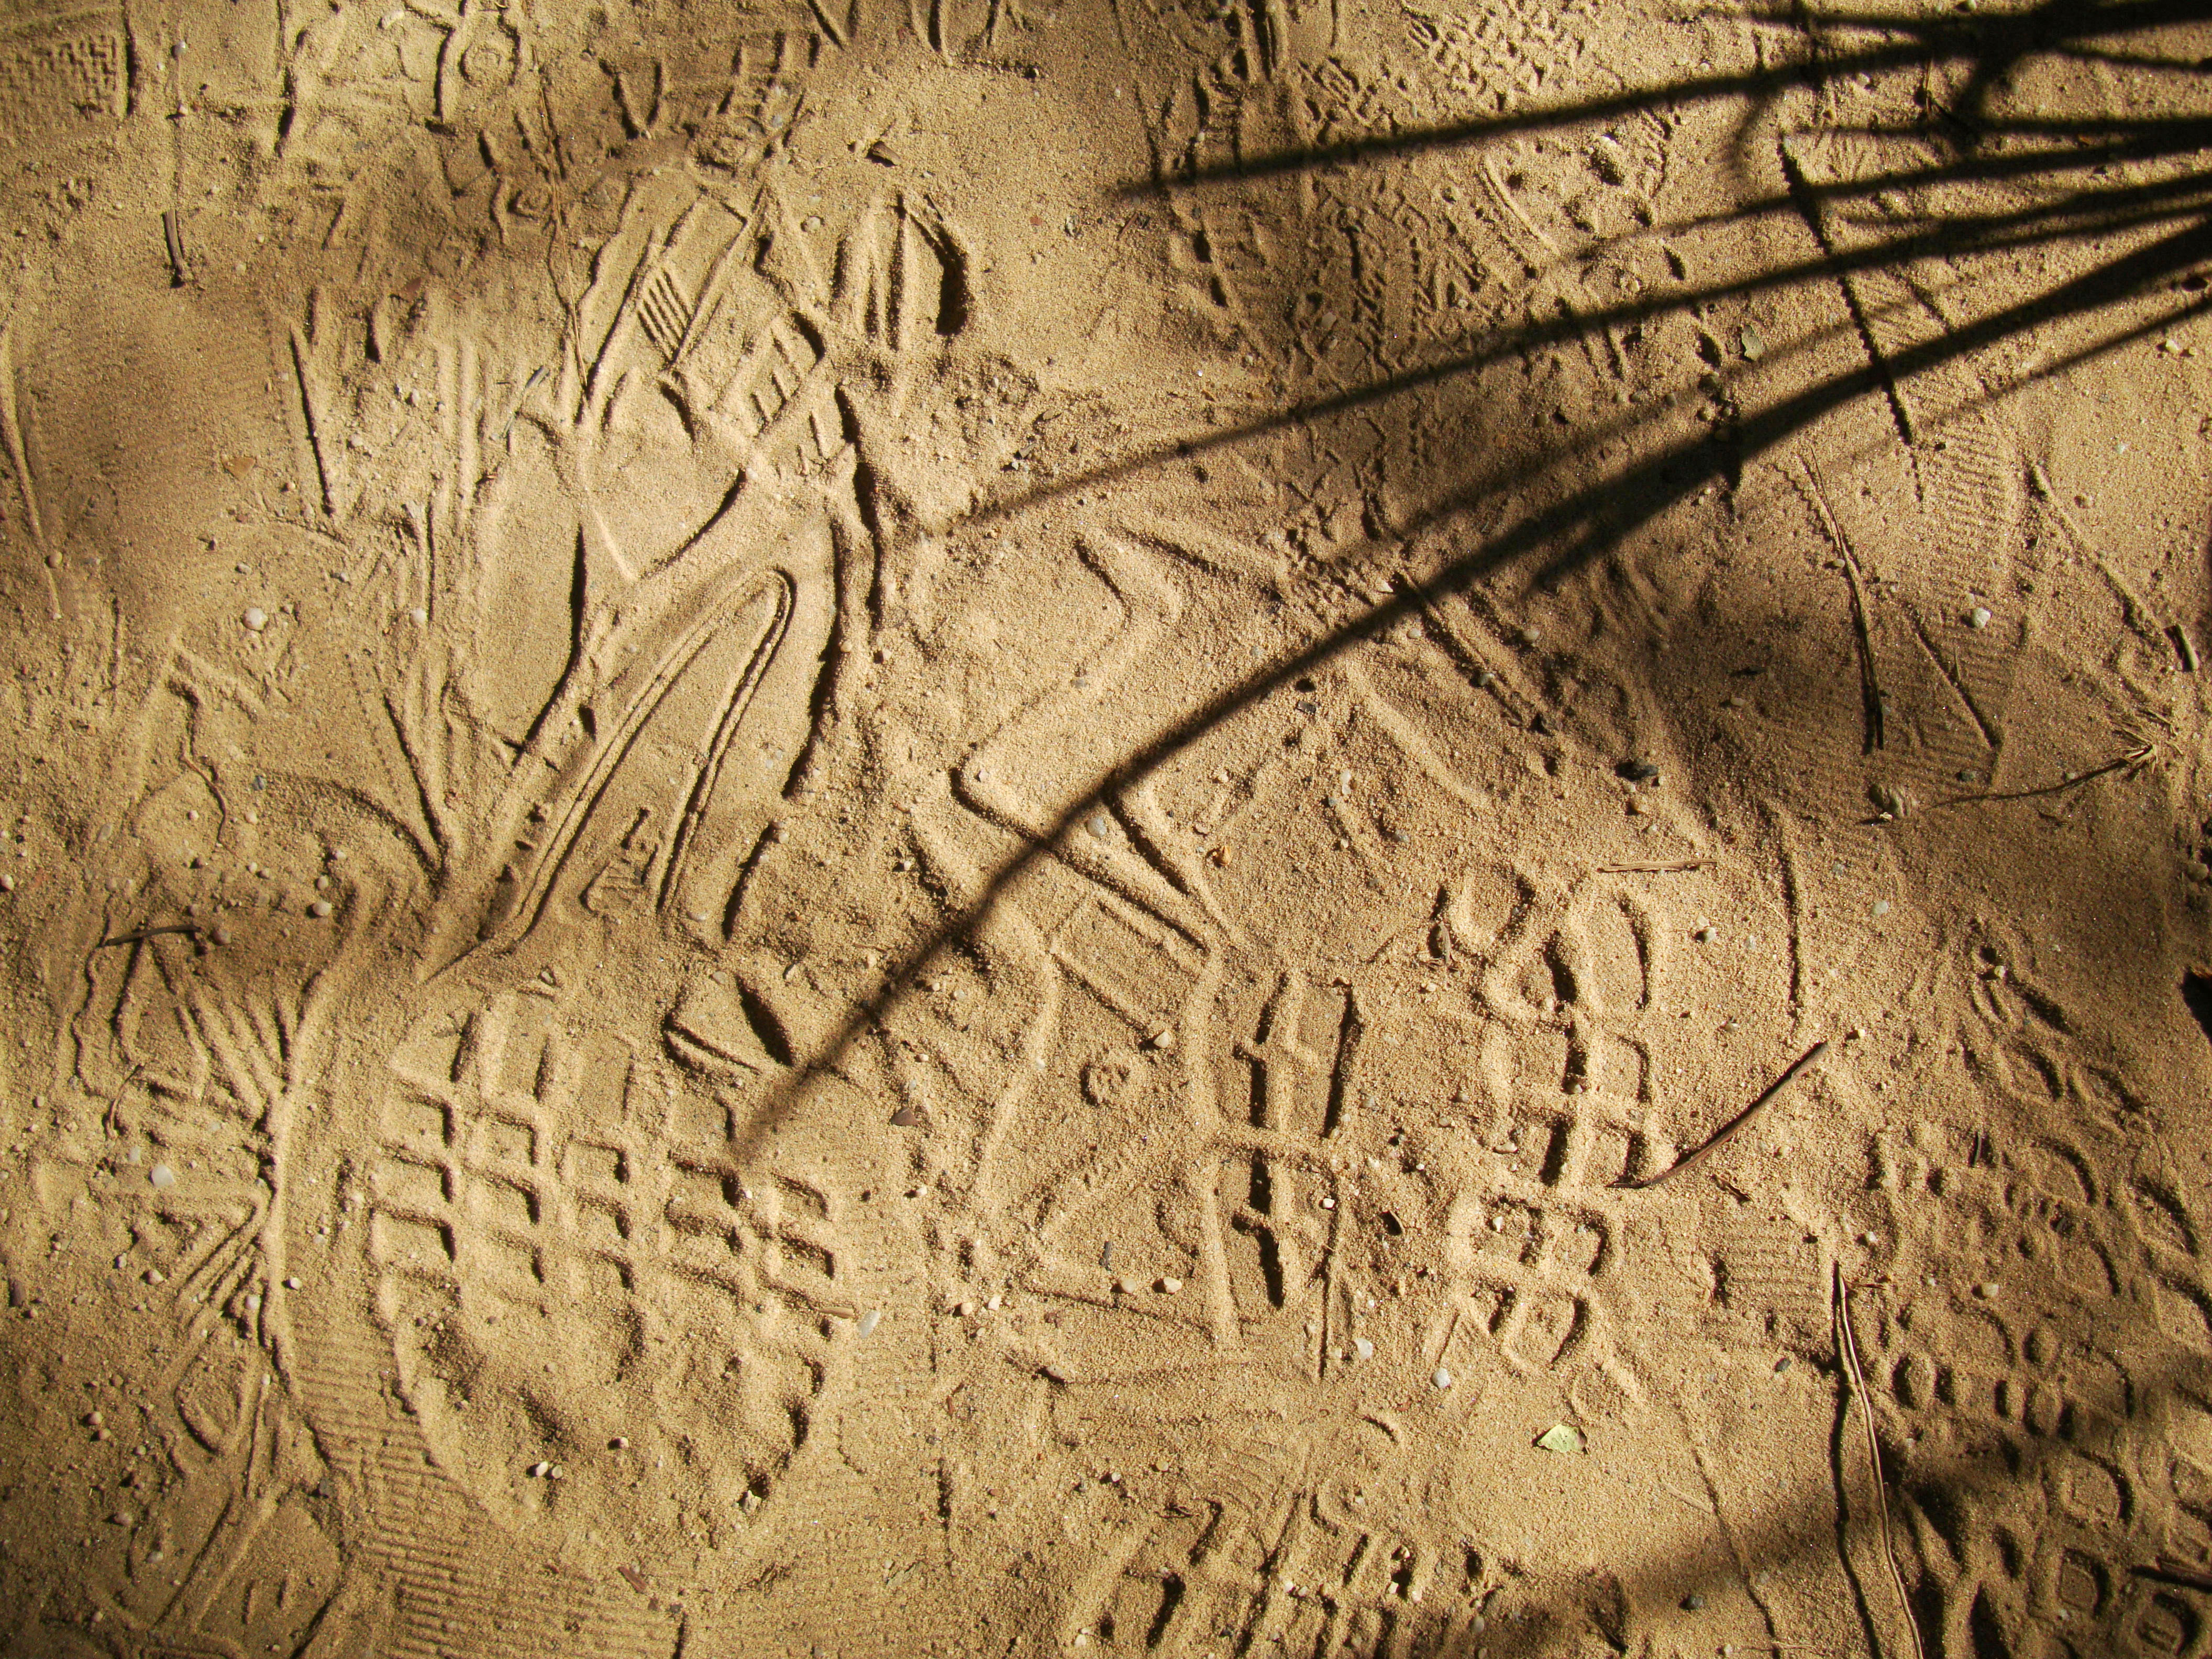 Textures Beach Sand Foot Prints Ripple Efects Noosa 01